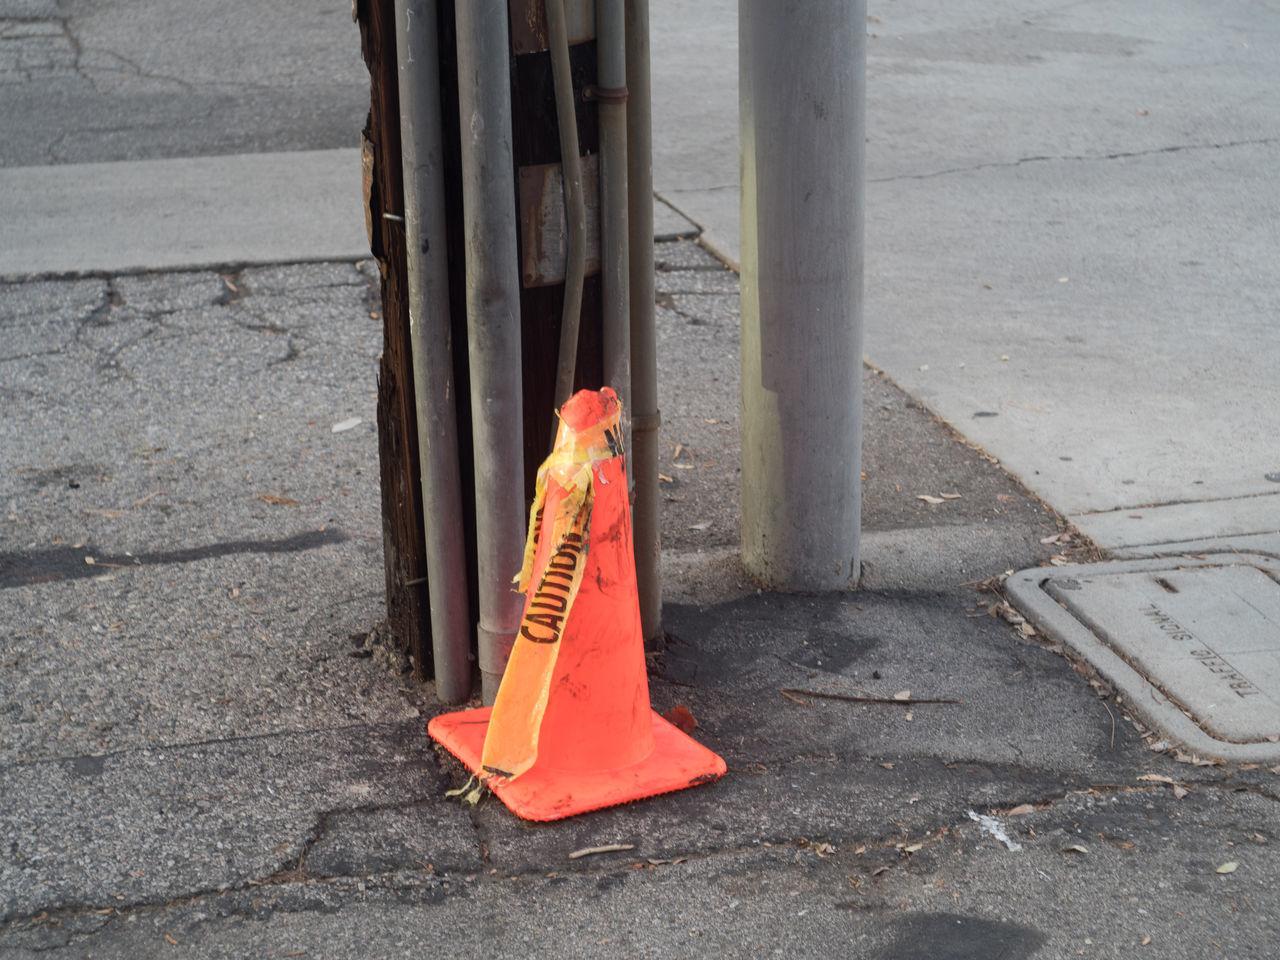 RED UMBRELLA ON STREET